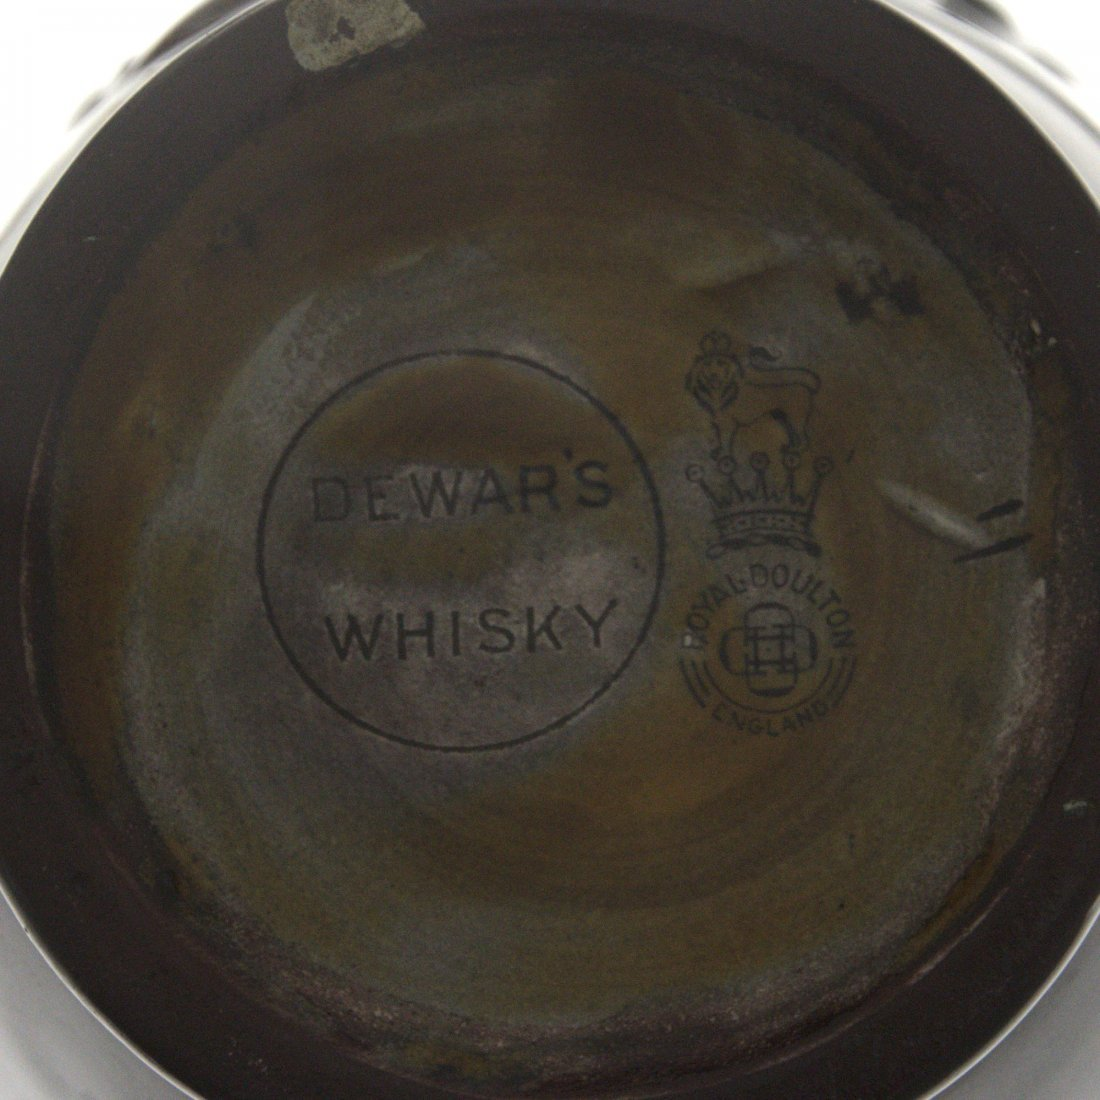 Royal Doulton Dewar's Whisky Tony Weller Ceramic Jug. - 3